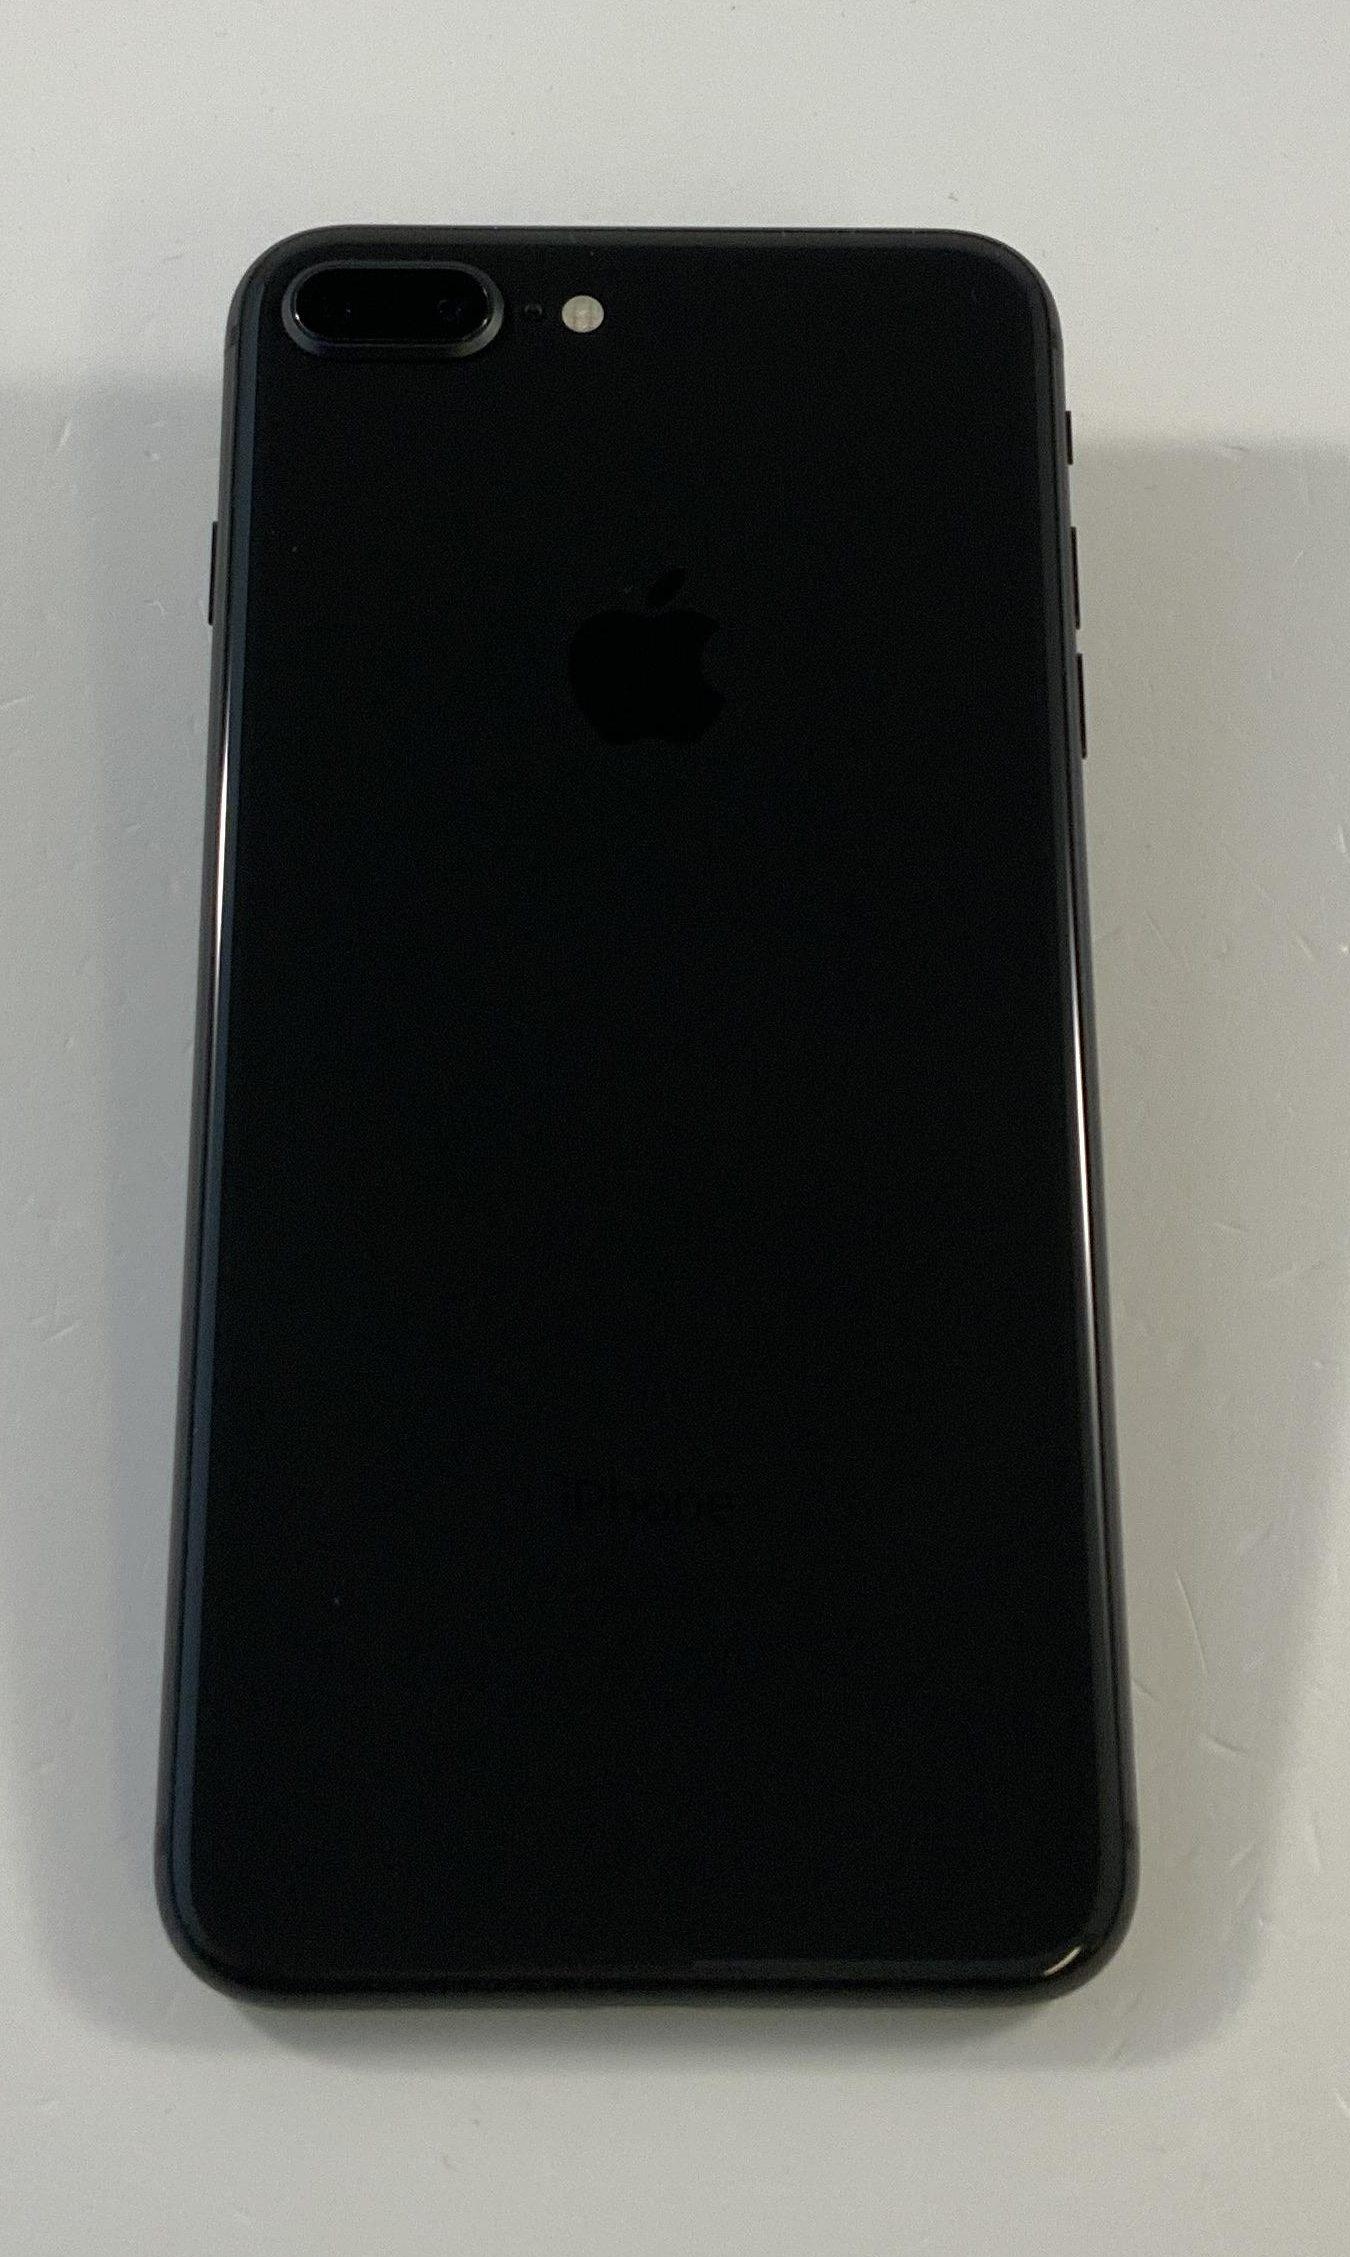 iPhone 8 Plus 64GB, 64GB, Space Gray, immagine 2